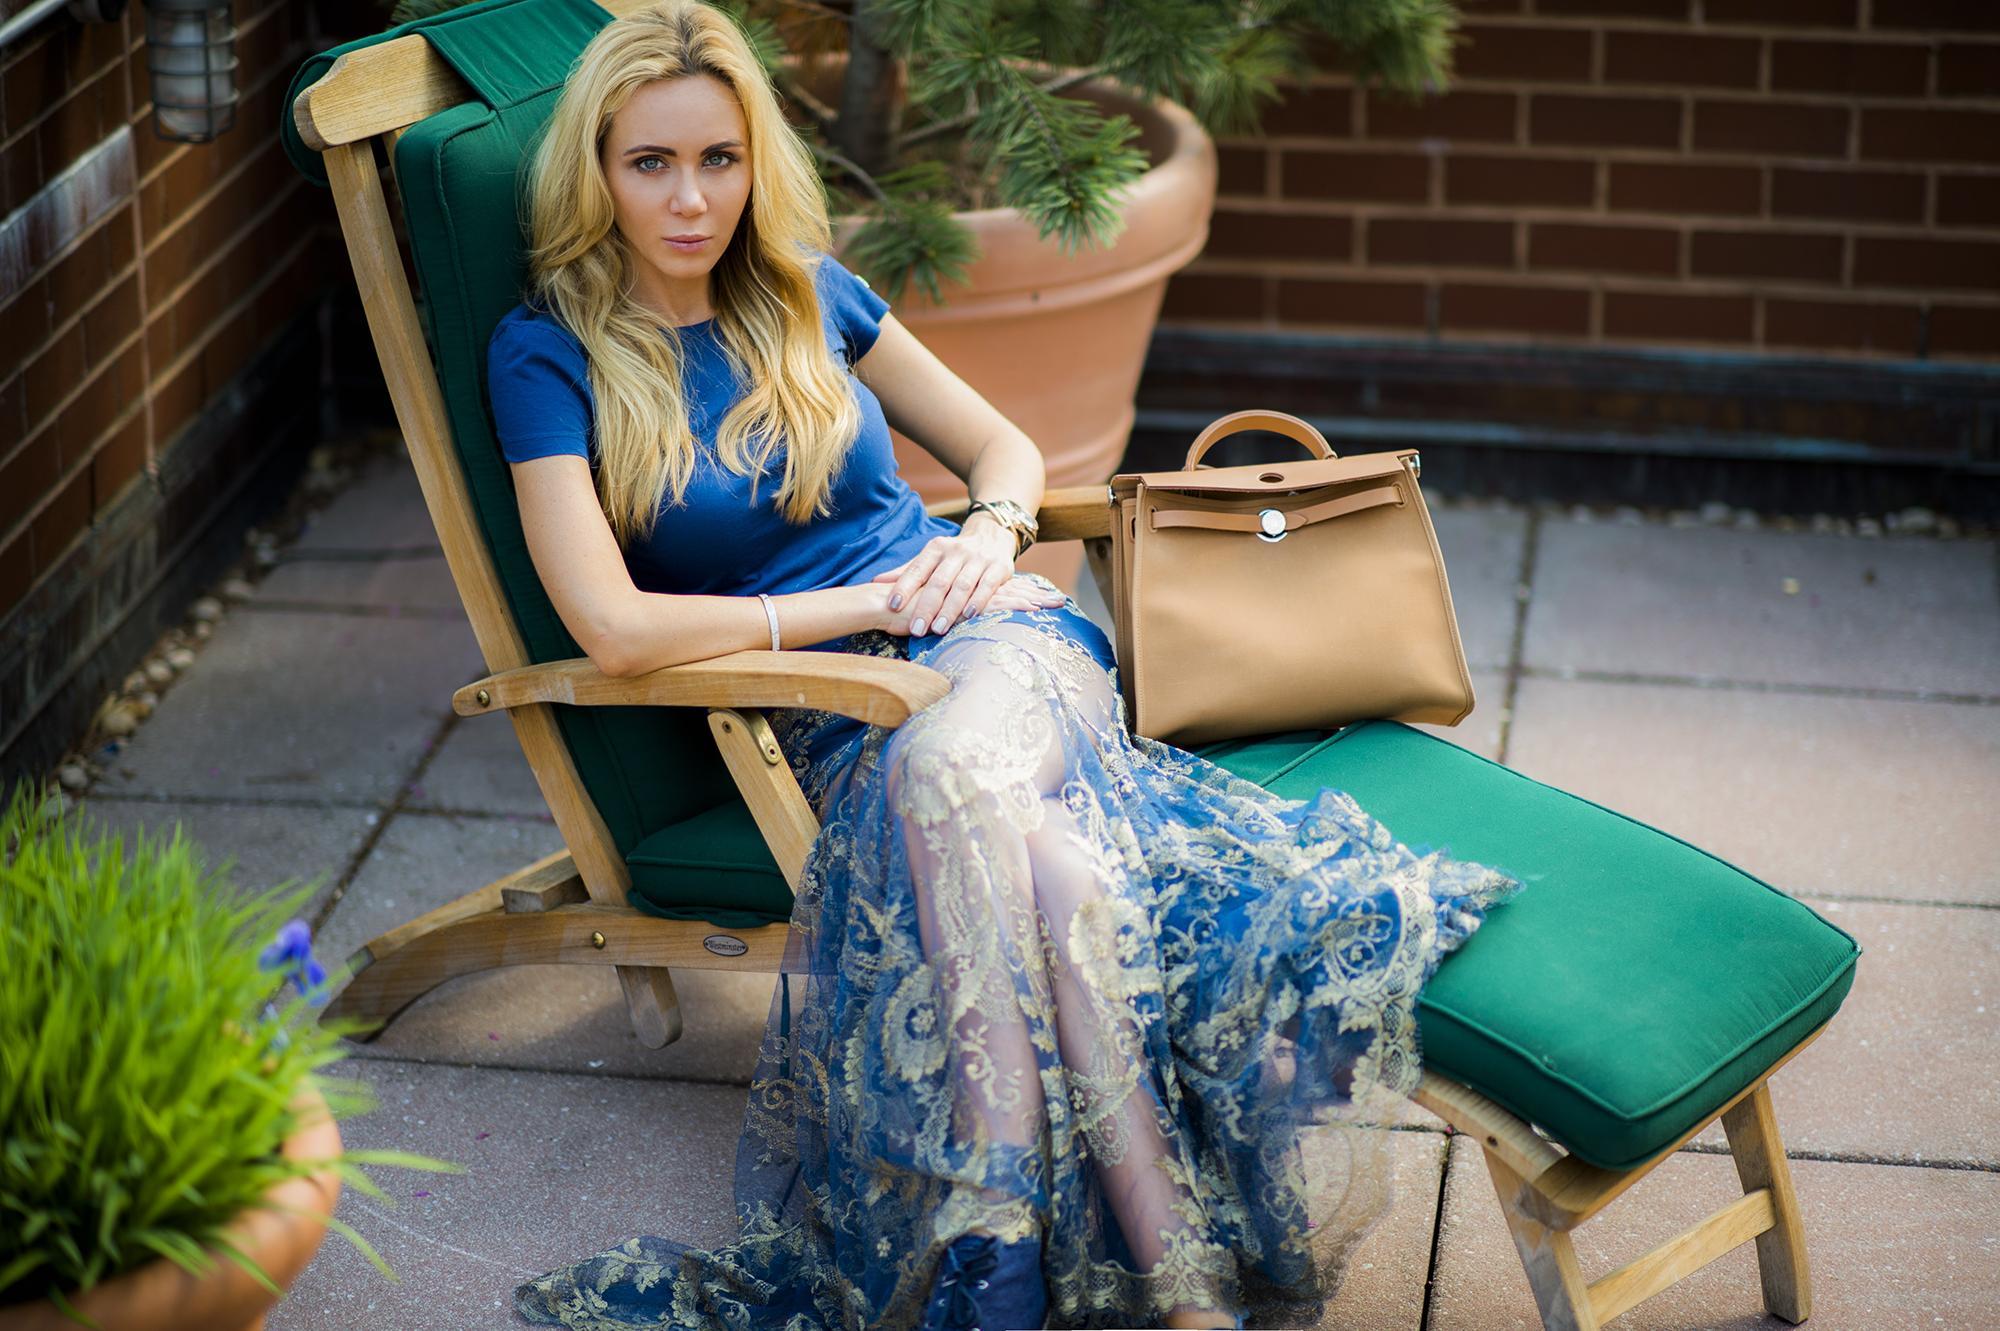 Double Denim fashion trend this summer